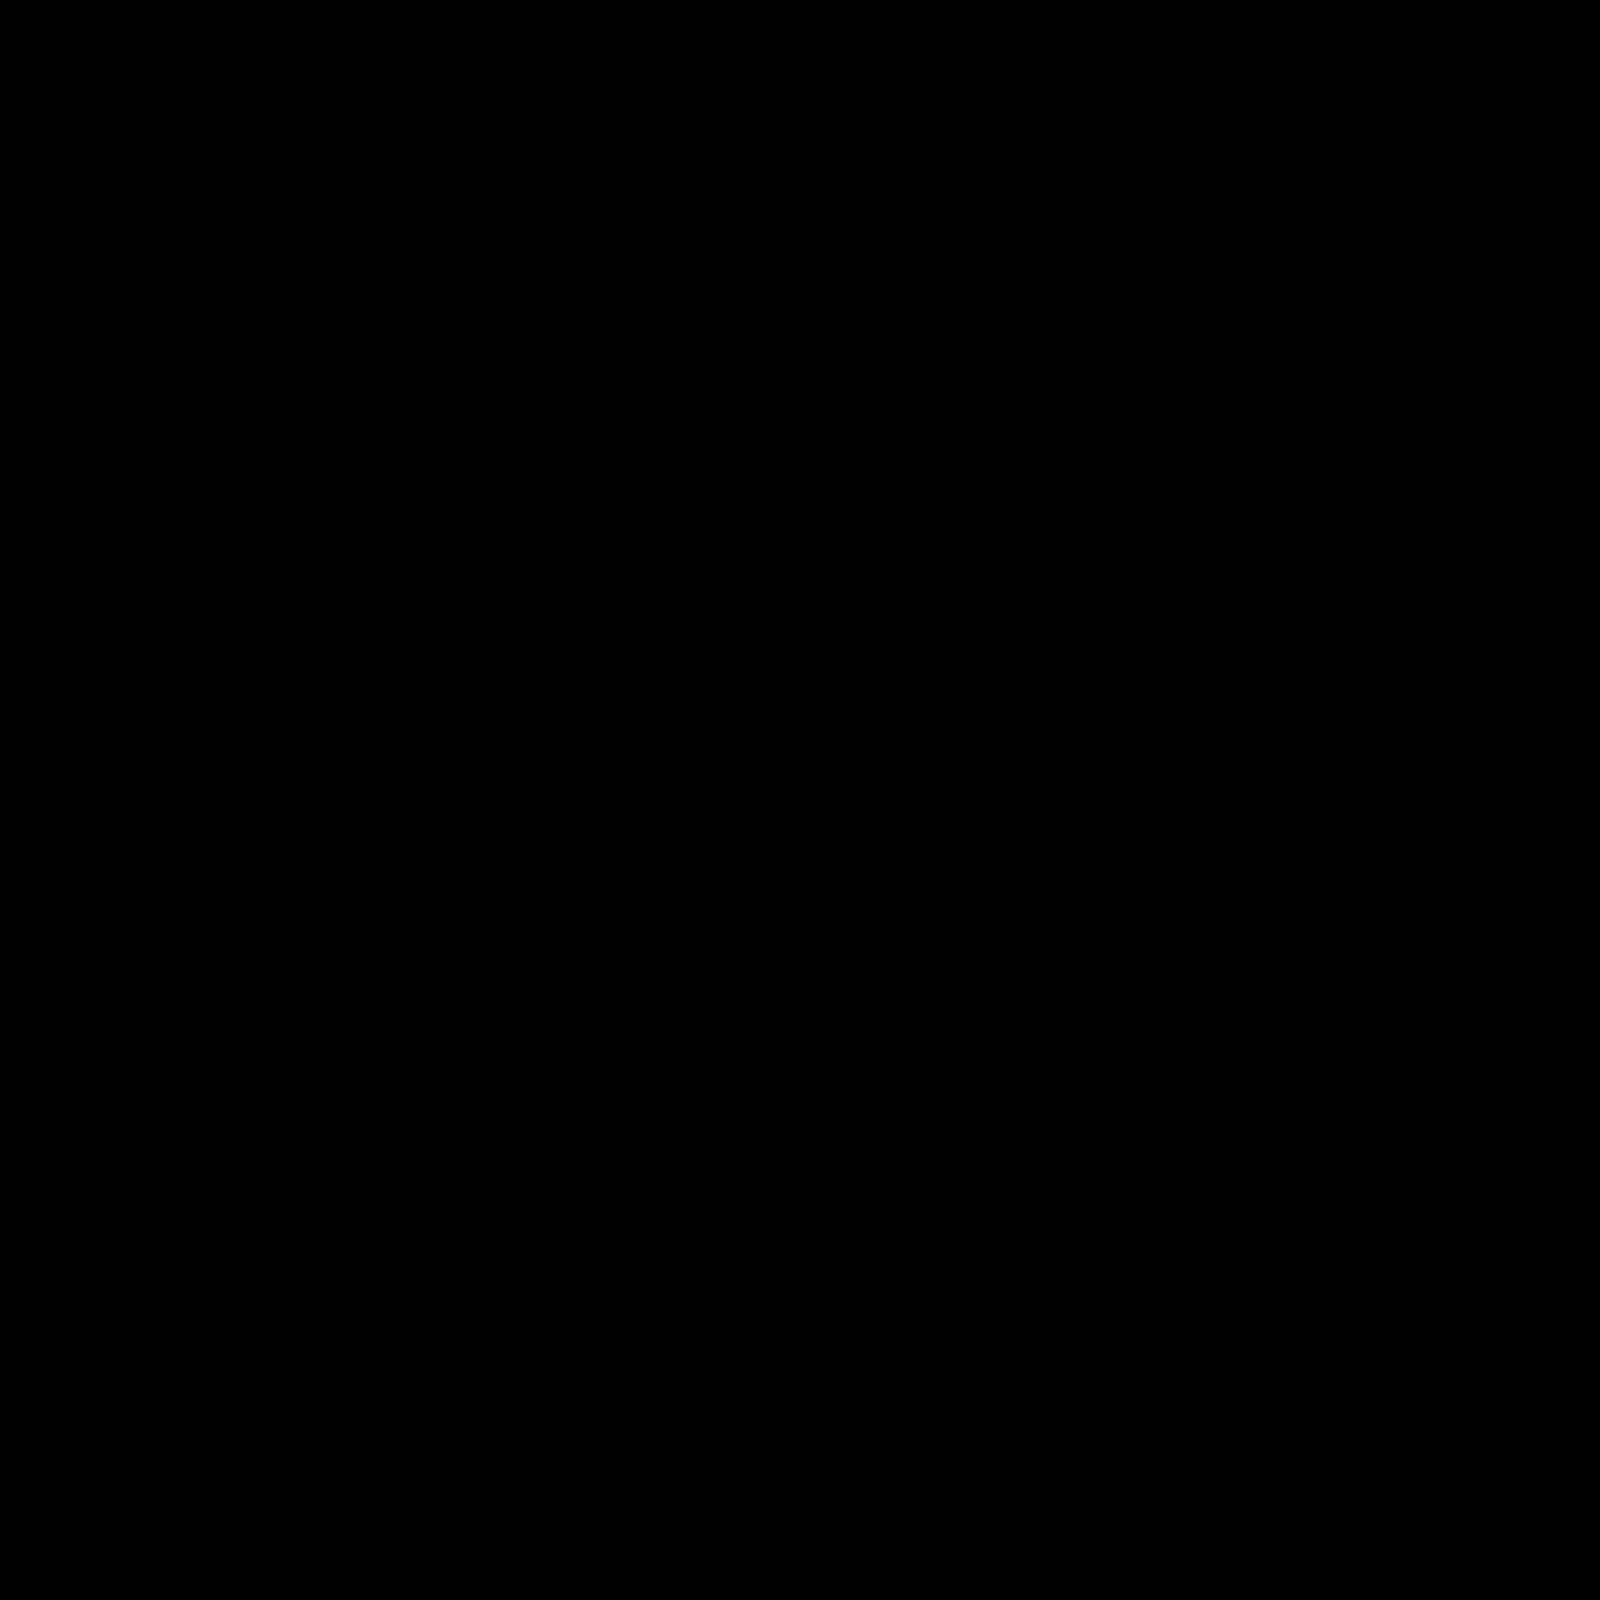 logo-phone.png